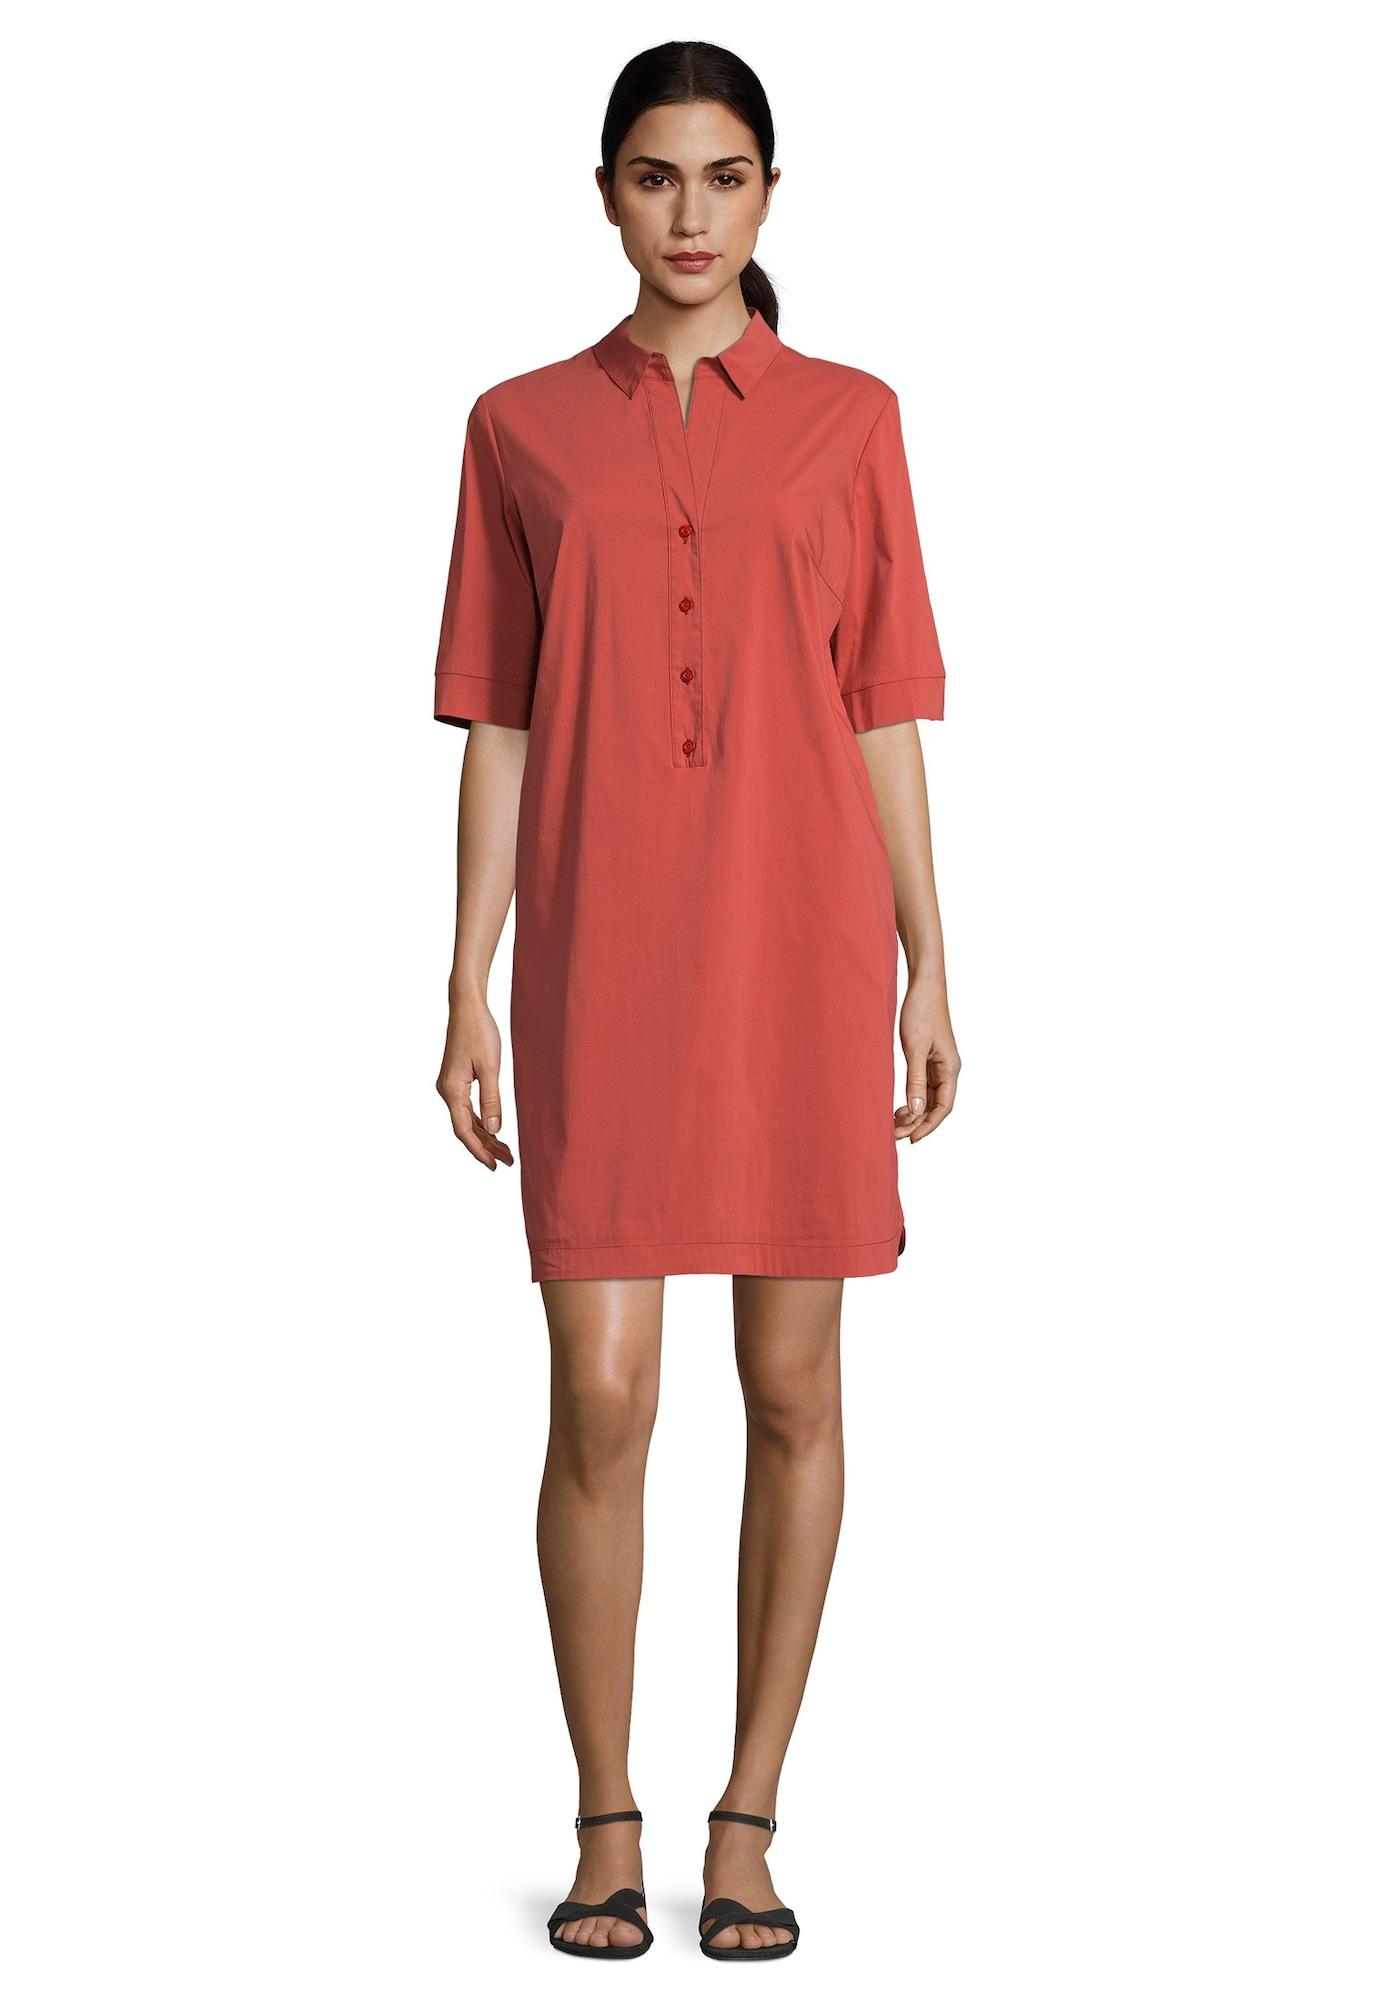 betty barclay - Hemdblusenkleid mit Knopfleiste